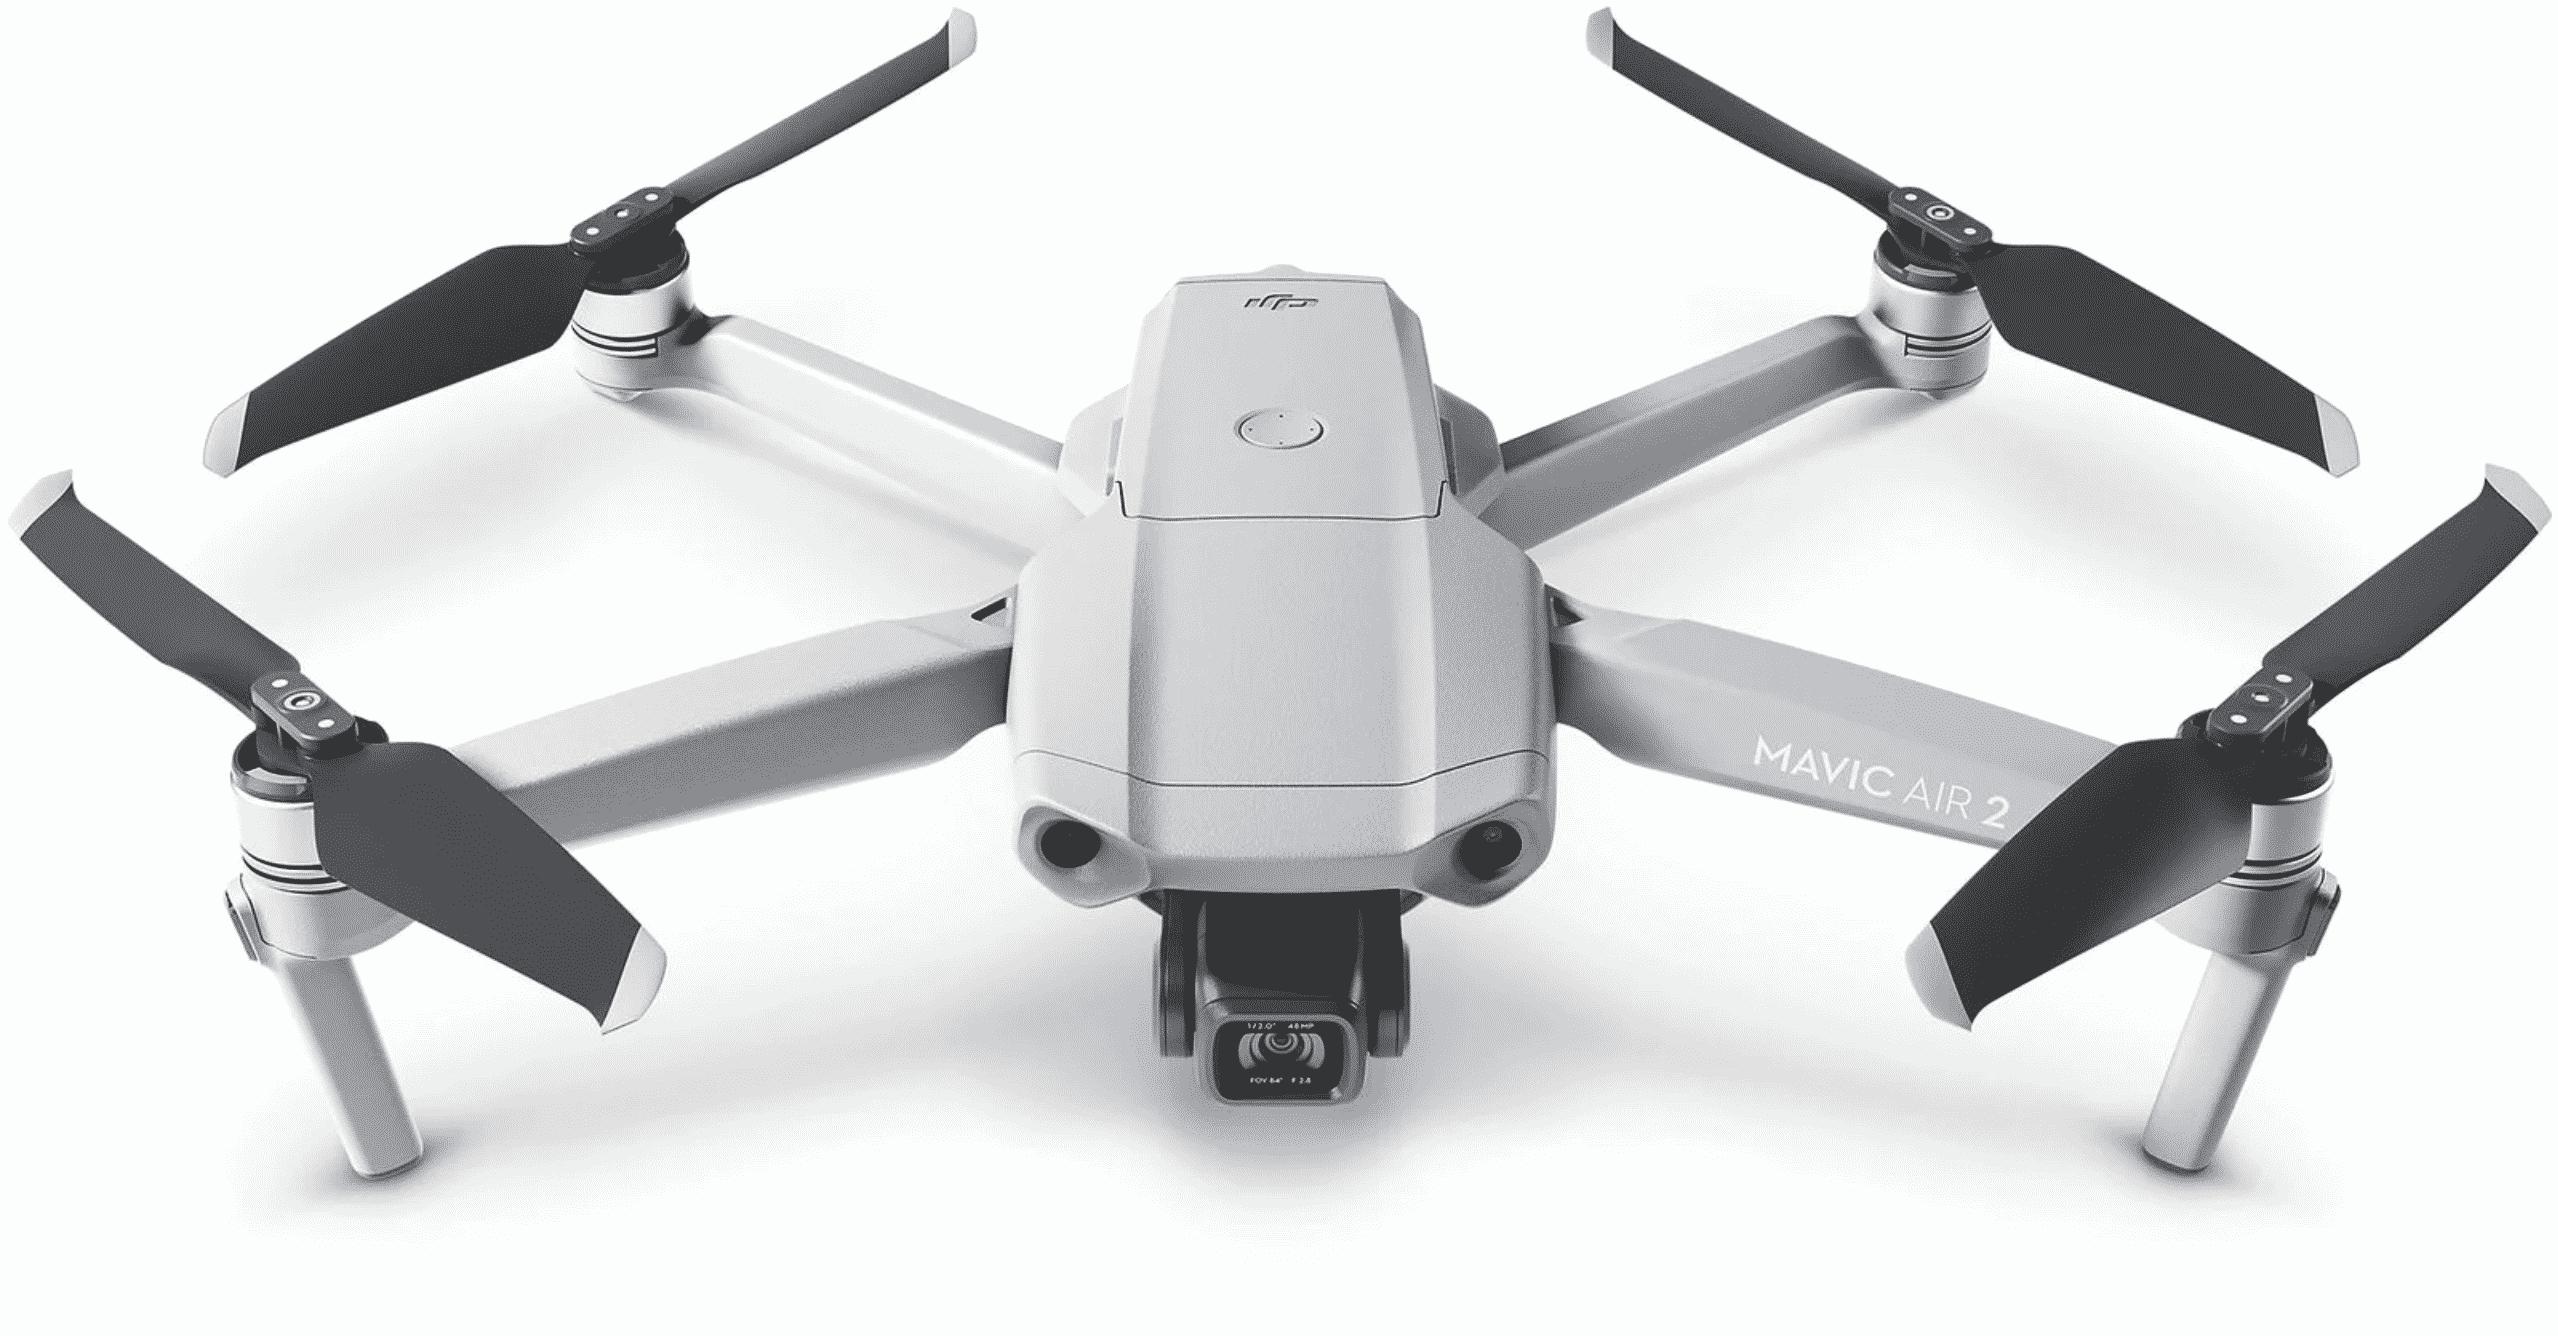 DJI's Mavic Air 2 drone